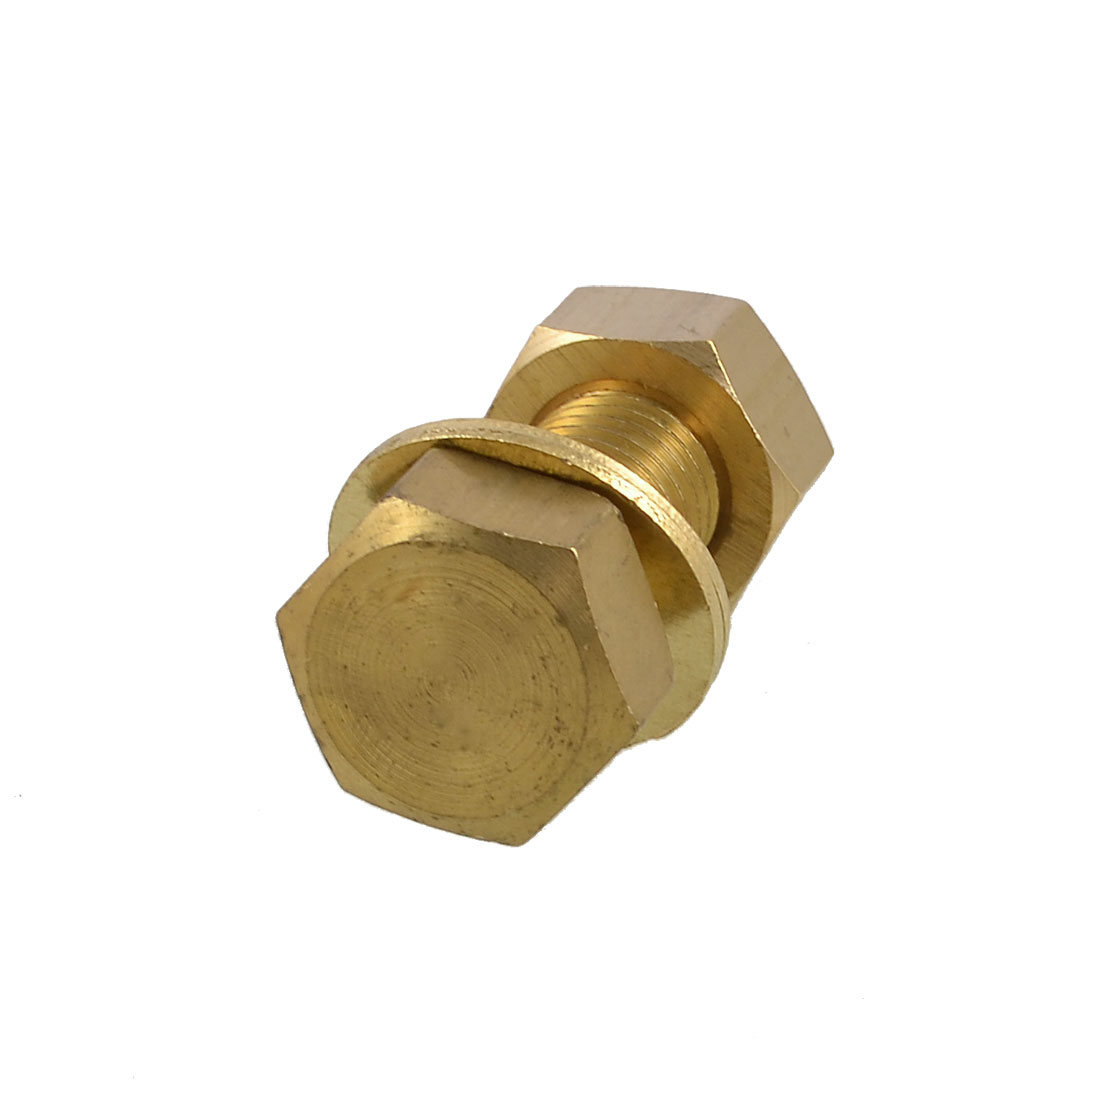 Hex Head Nut 18mm x 50mm Threaded Brass Screw Bolt w 2 Washers